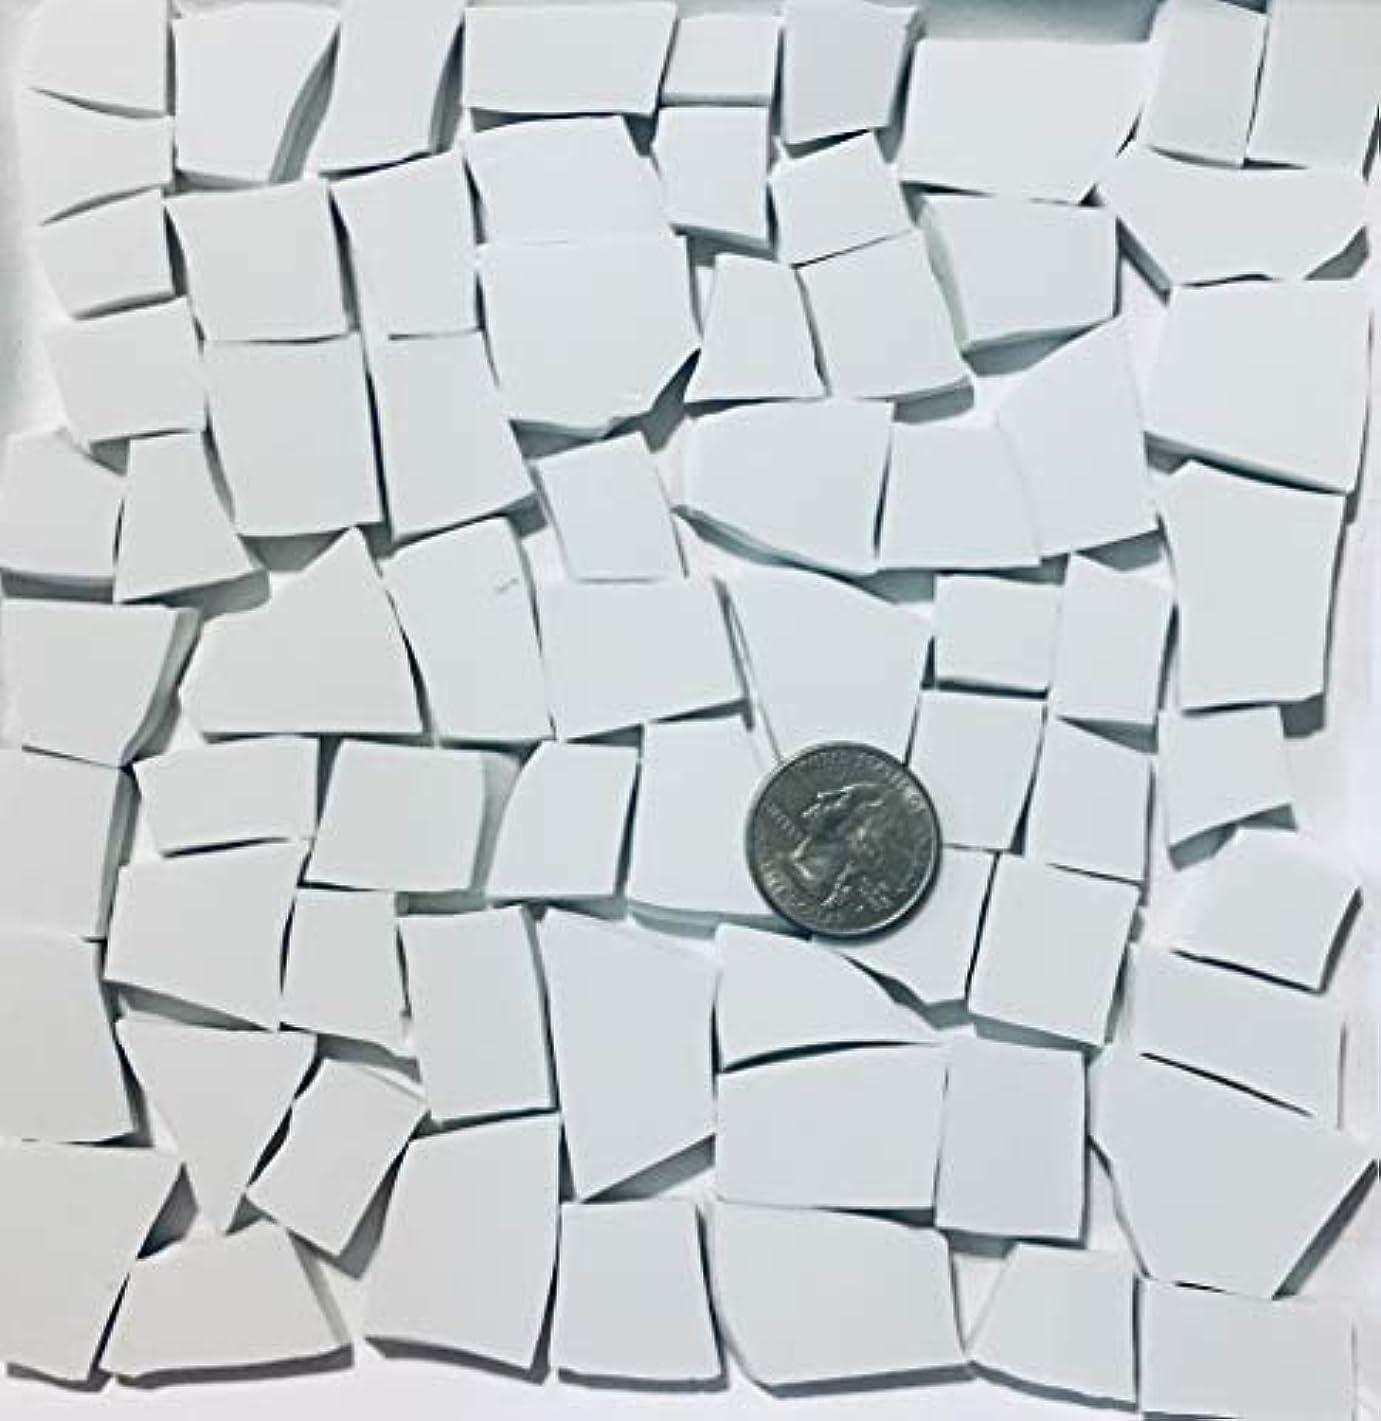 Mosaic Art & Crafts Supply ~ All White Fine China Tiles (B659)